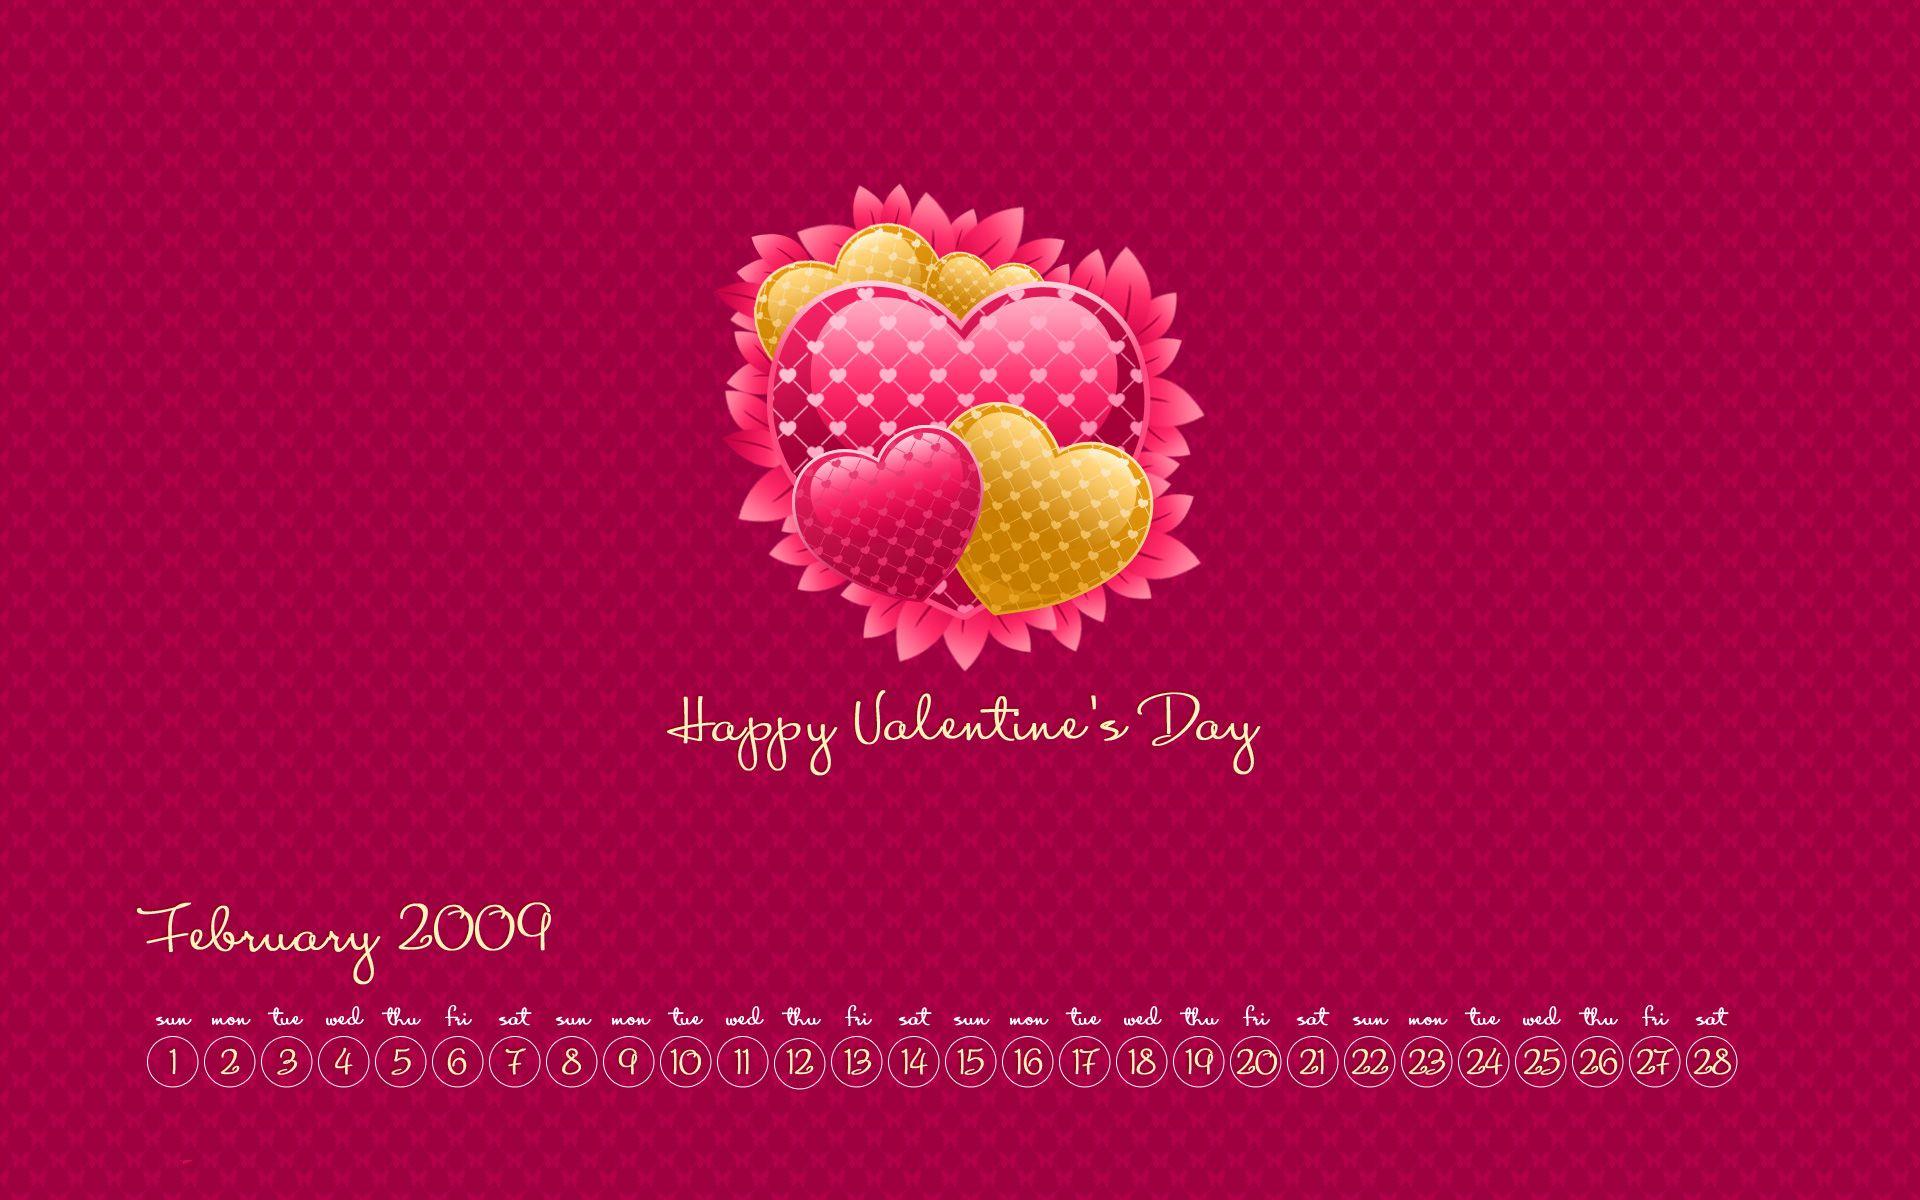 Create february 2009 calendar wallpaper in photoshop cs4 ps create february 2009 calendar wallpaper in photoshop cs4 baditri Image collections